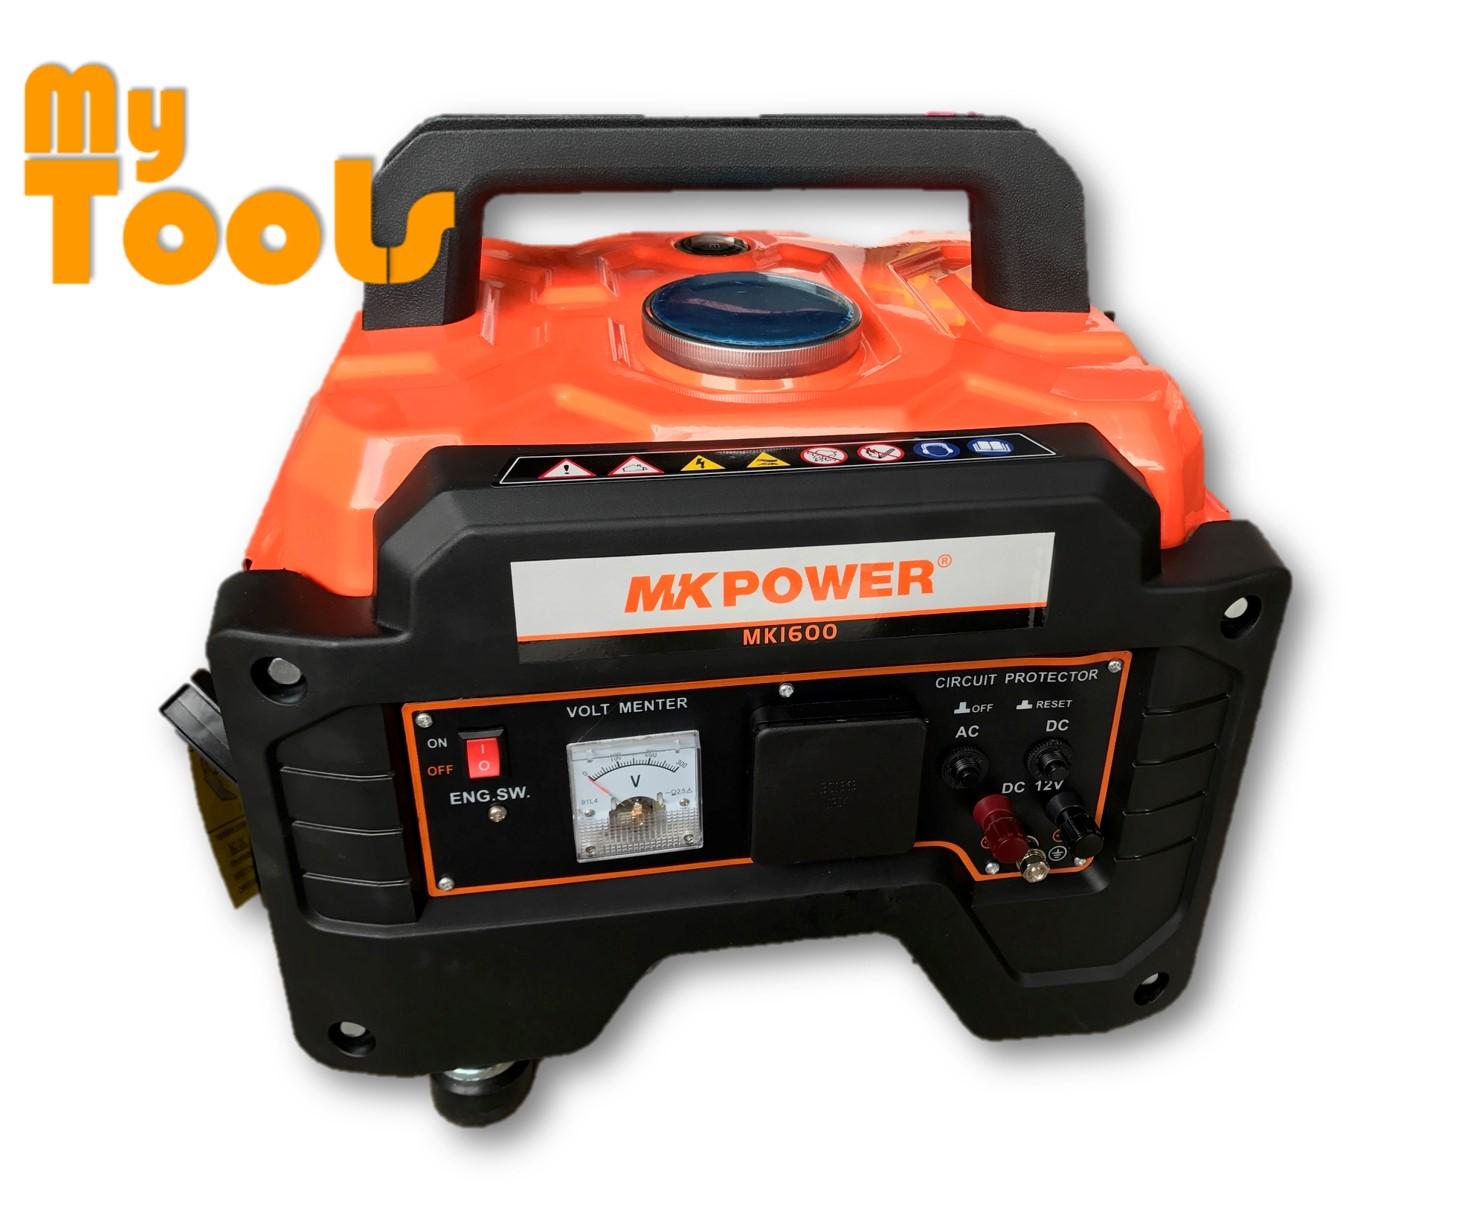 Mk Power MK1600 Portable Four Stroke Petrol Generator 1000W